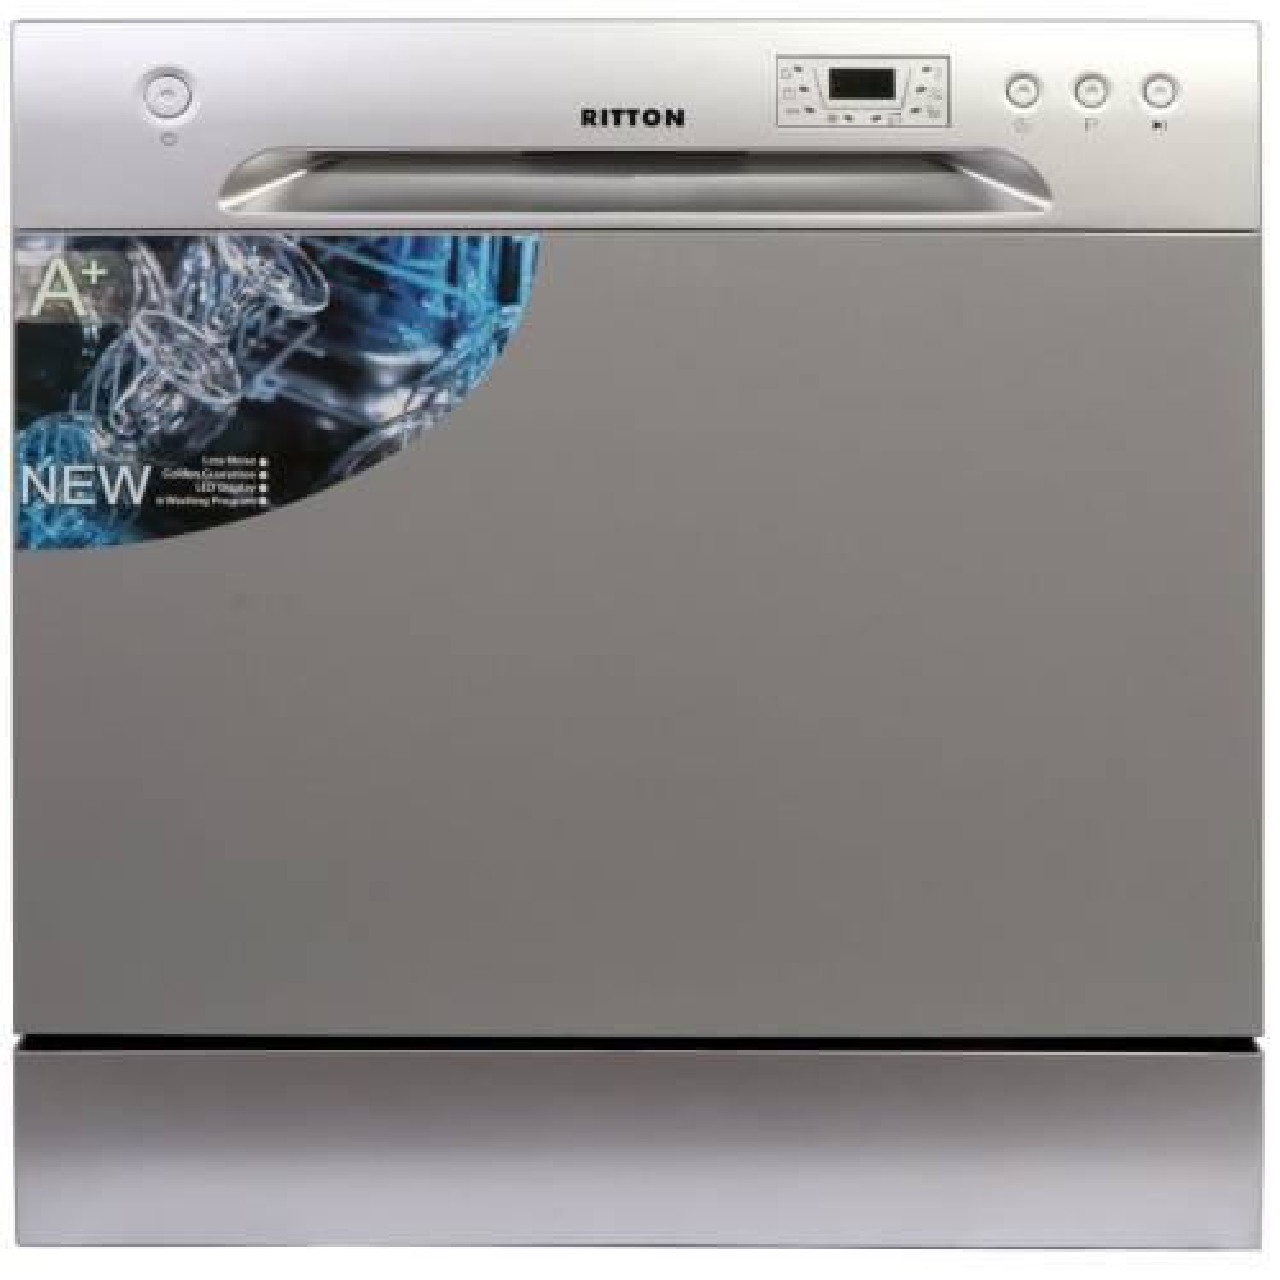 ماشین ظرفشویی رومیزی ریتون مدل DW-3803